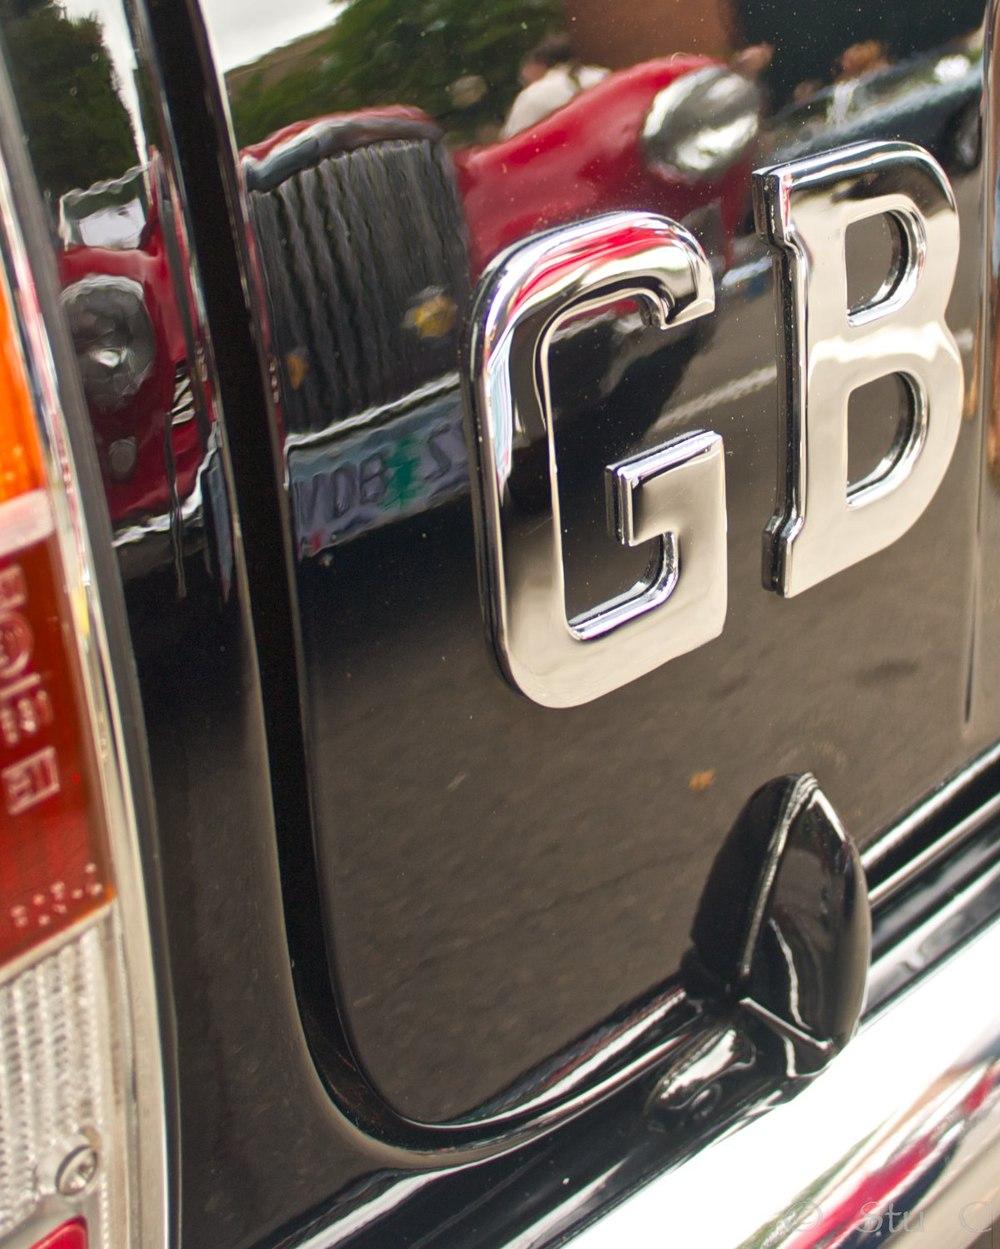 GB = Great Britain?